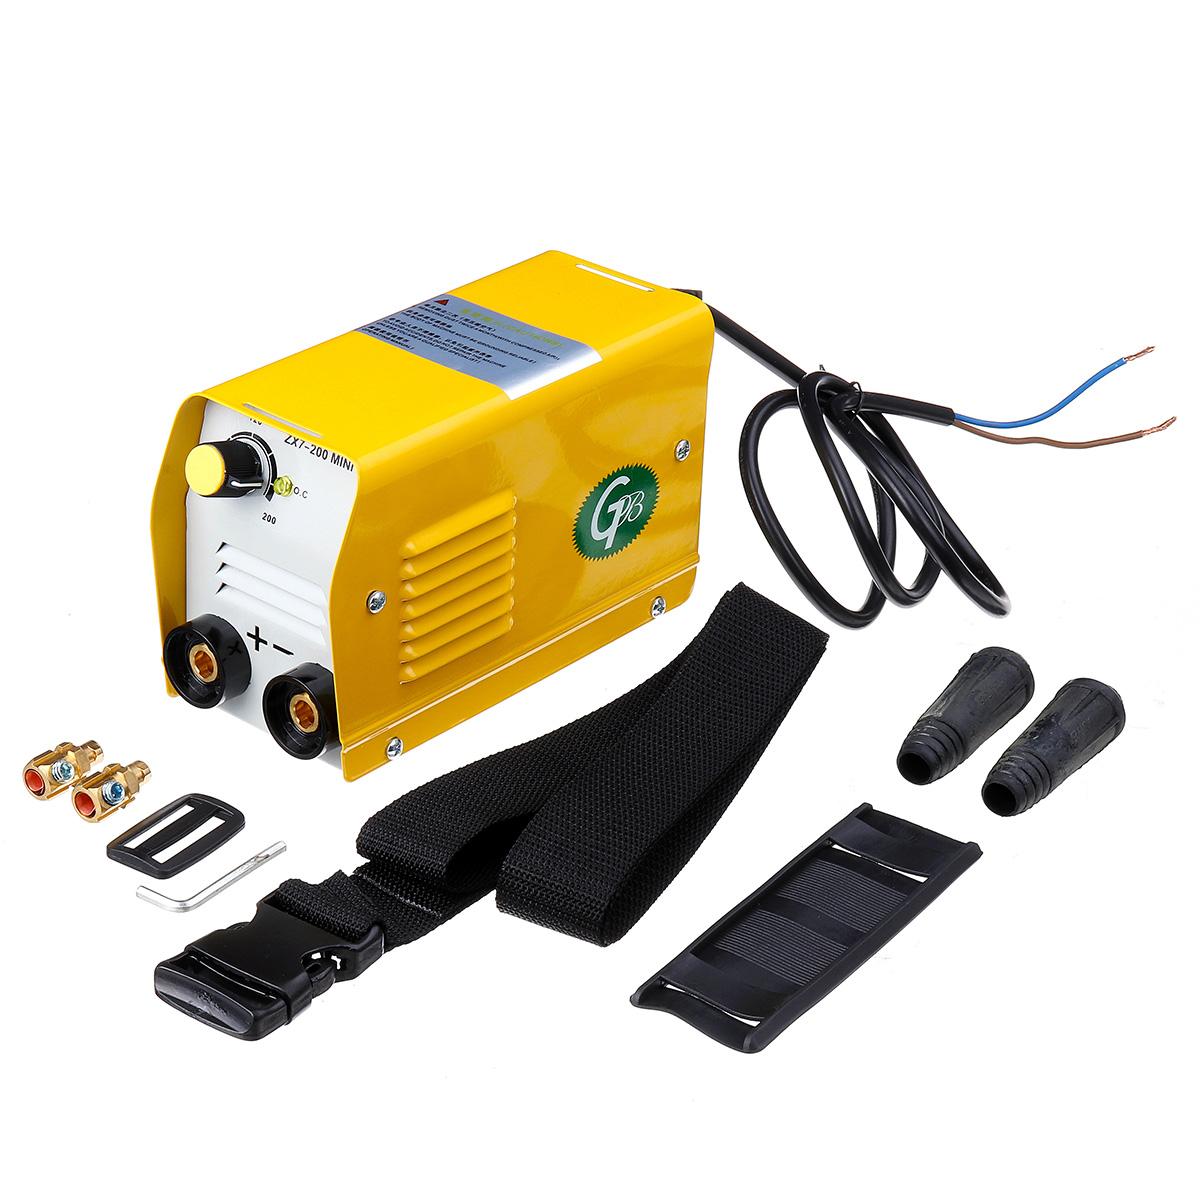 ZX7-200 miniGB 200A Mini Electric Welding Machine IGBT DC Inverter ARC MMA Stick Welder